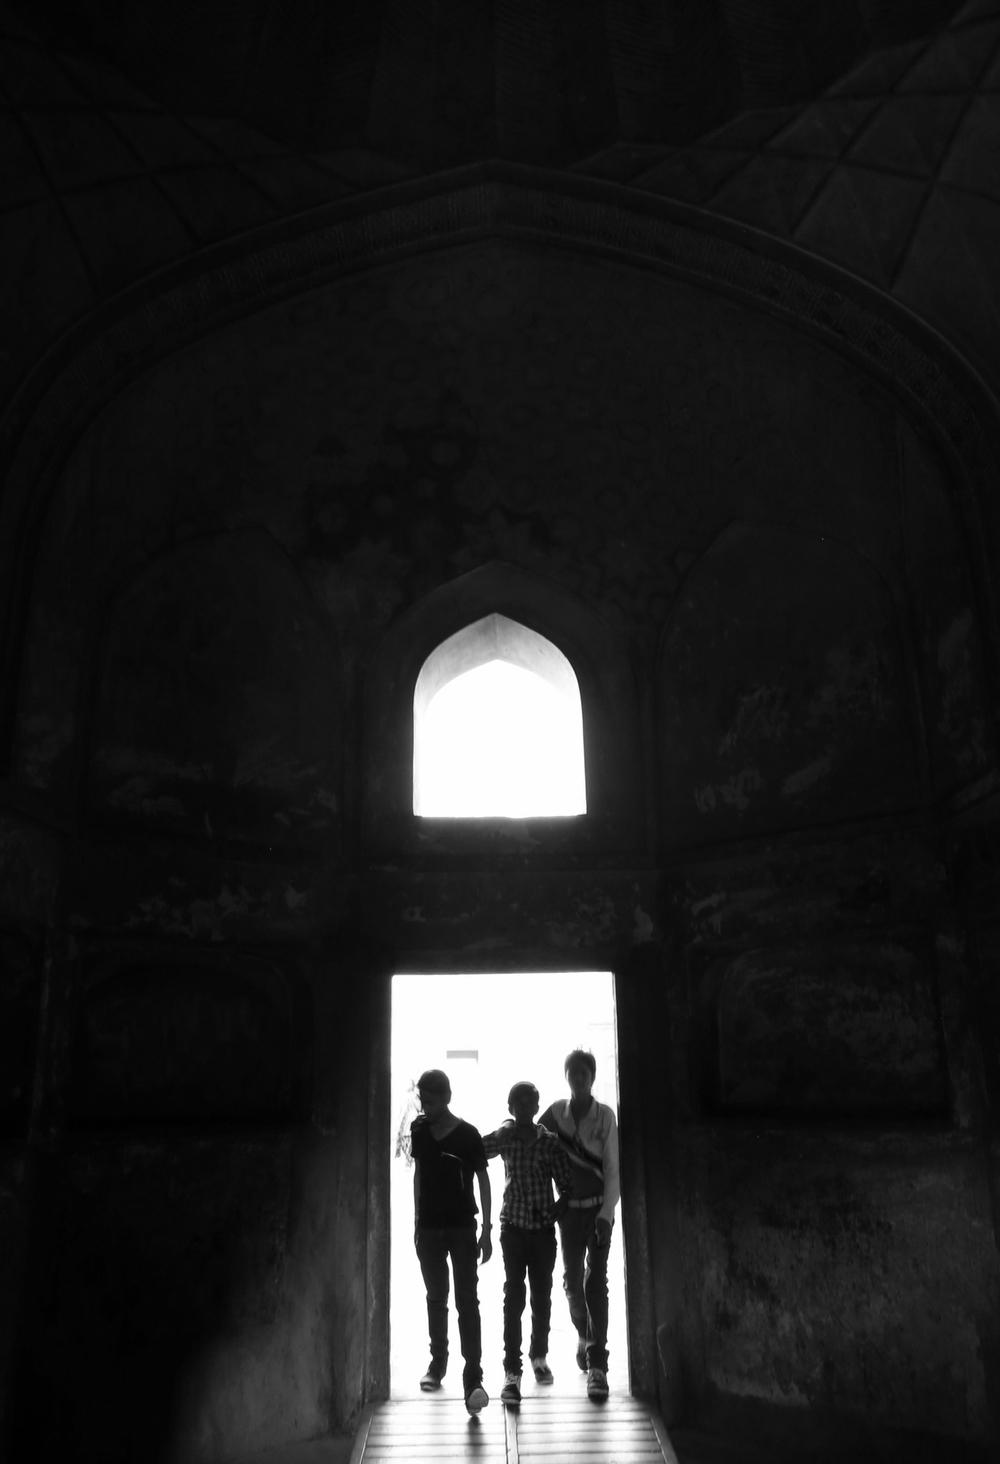 Teens - Elephanta Island, Mumbai